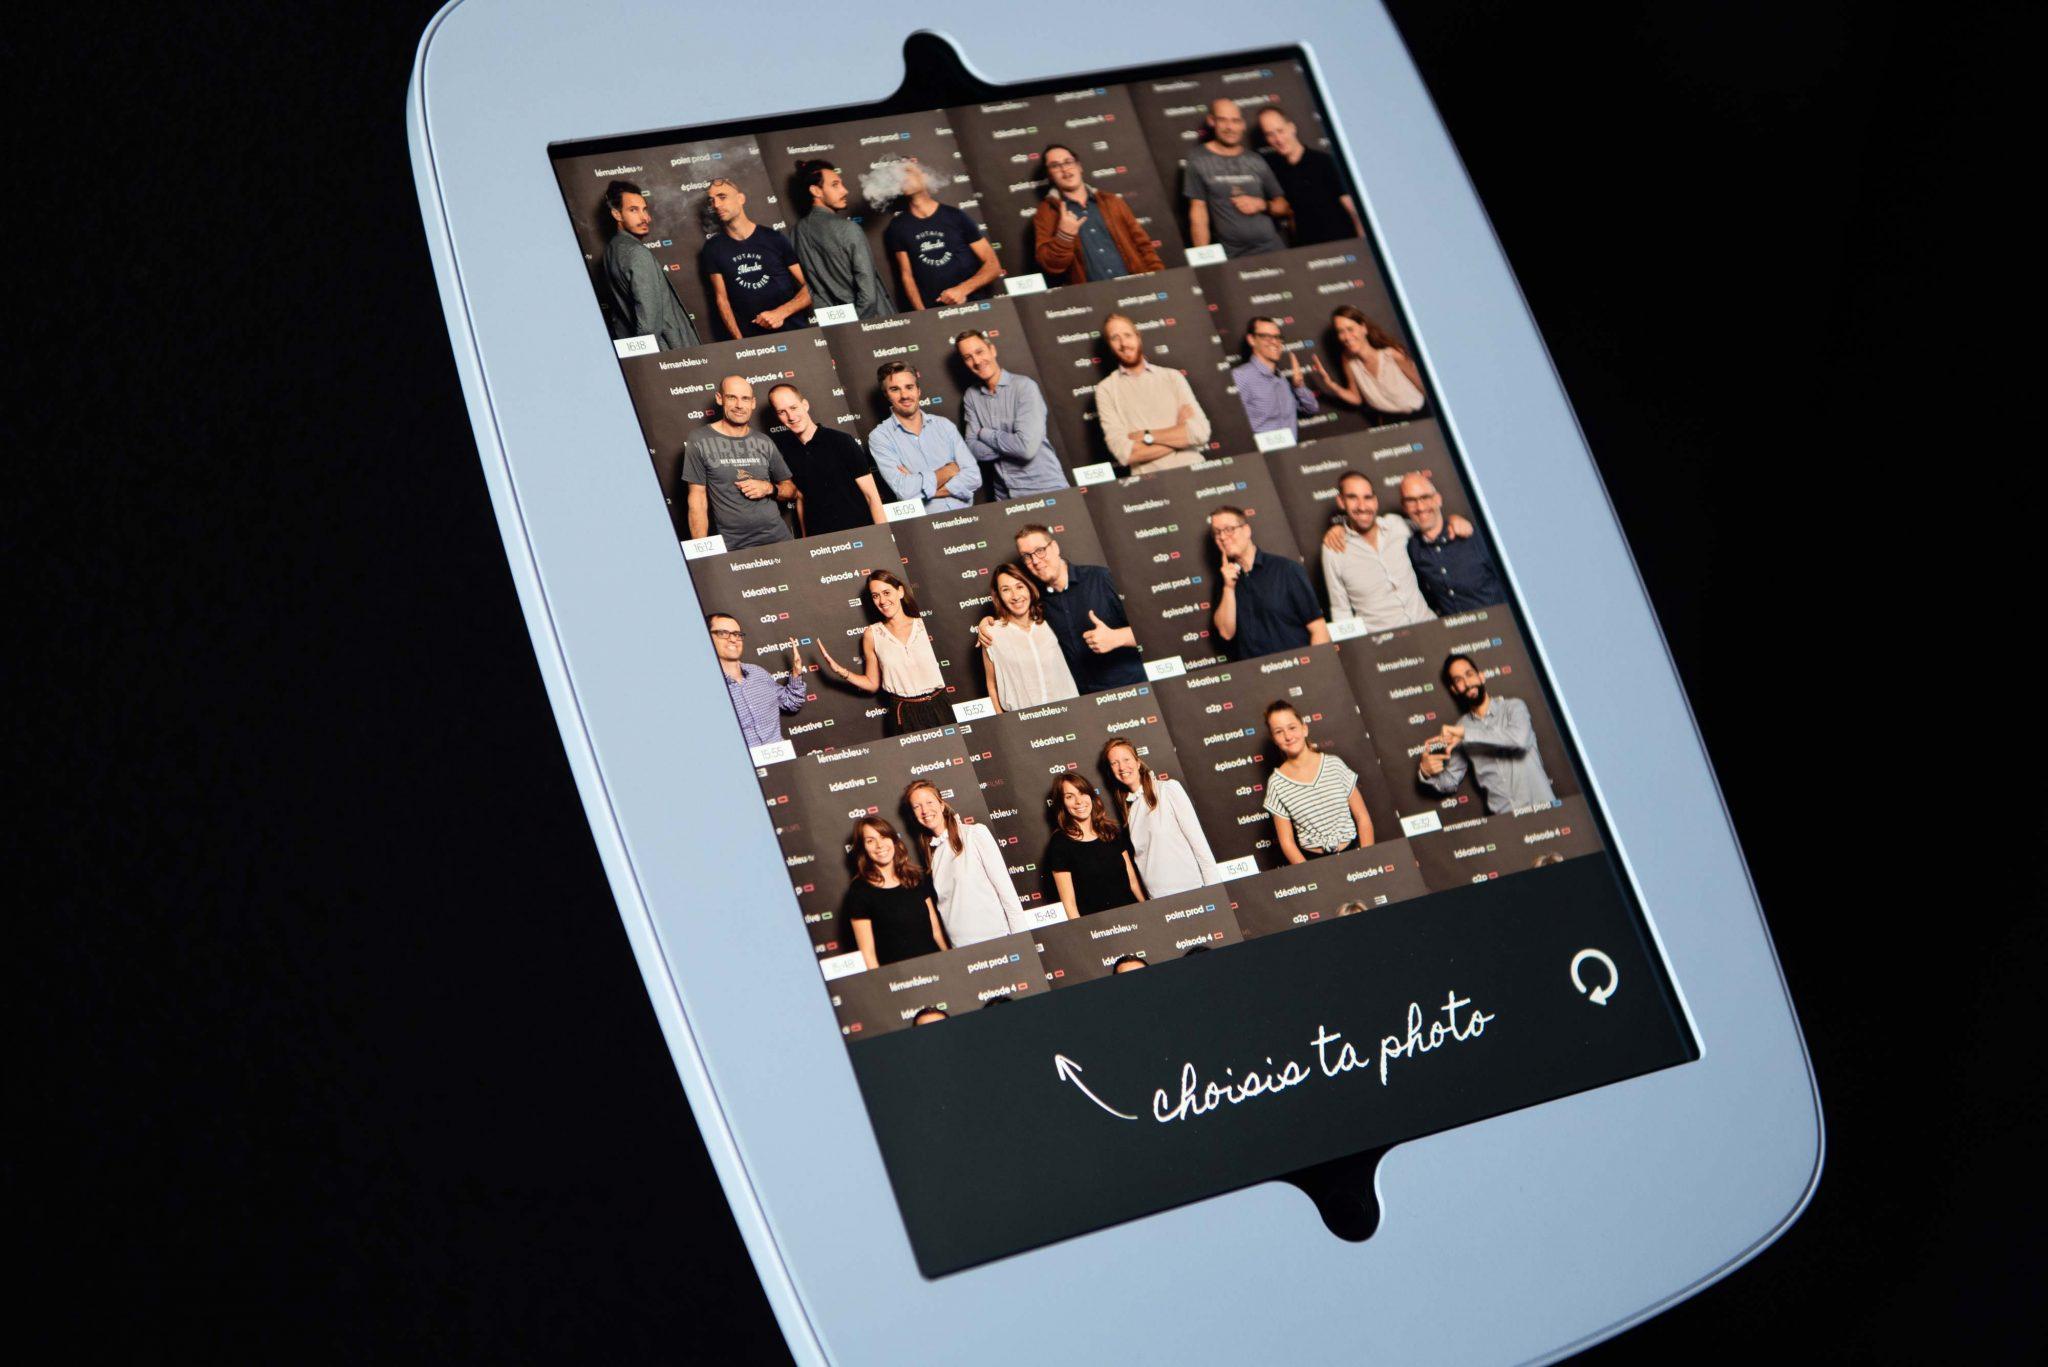 Photocall geneve iPad